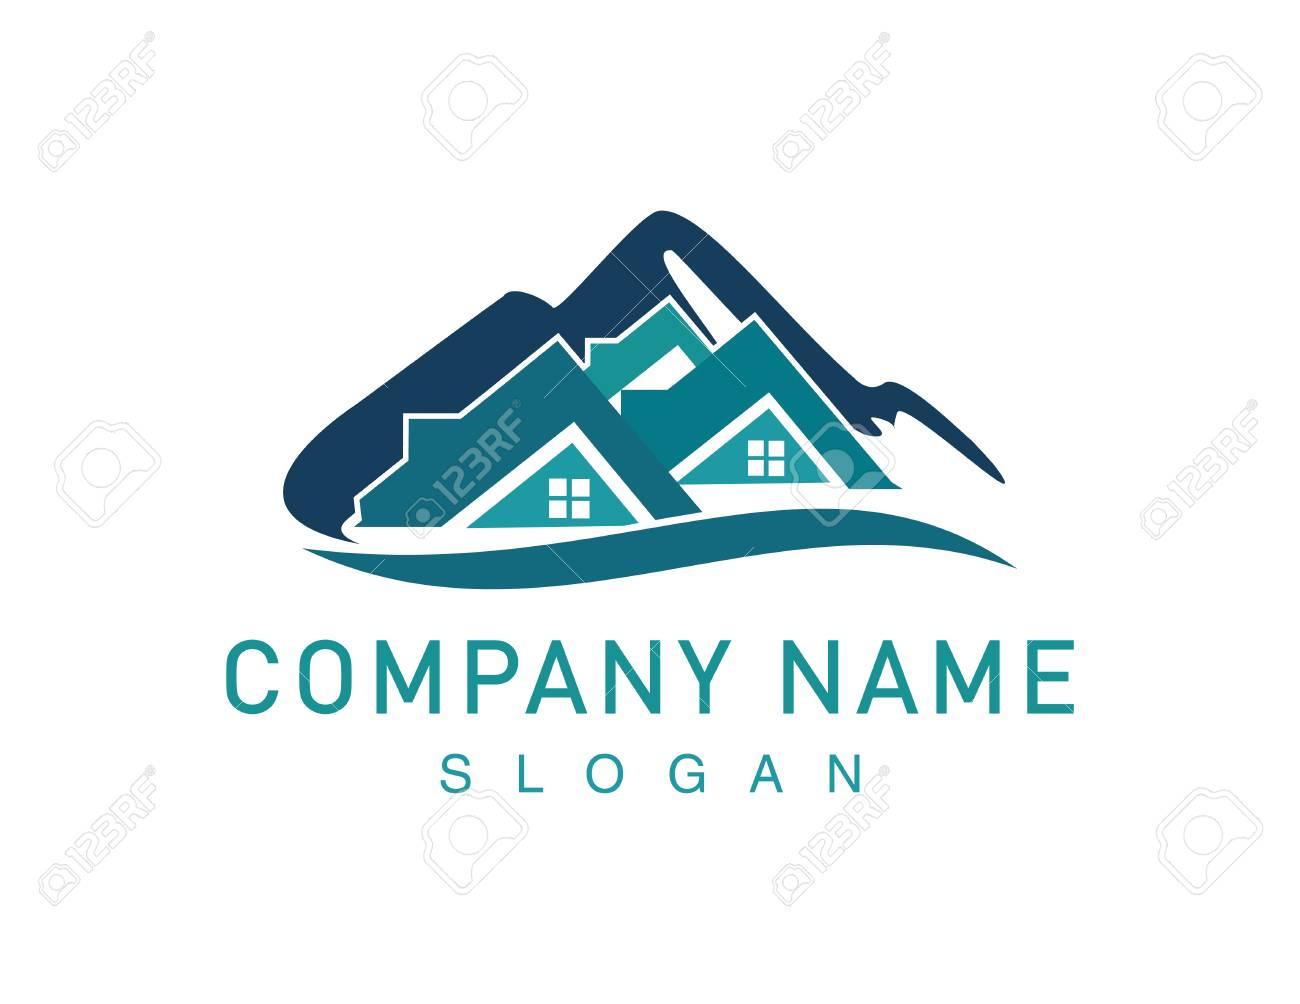 Mountains real estate symbol illustration. - 92952773